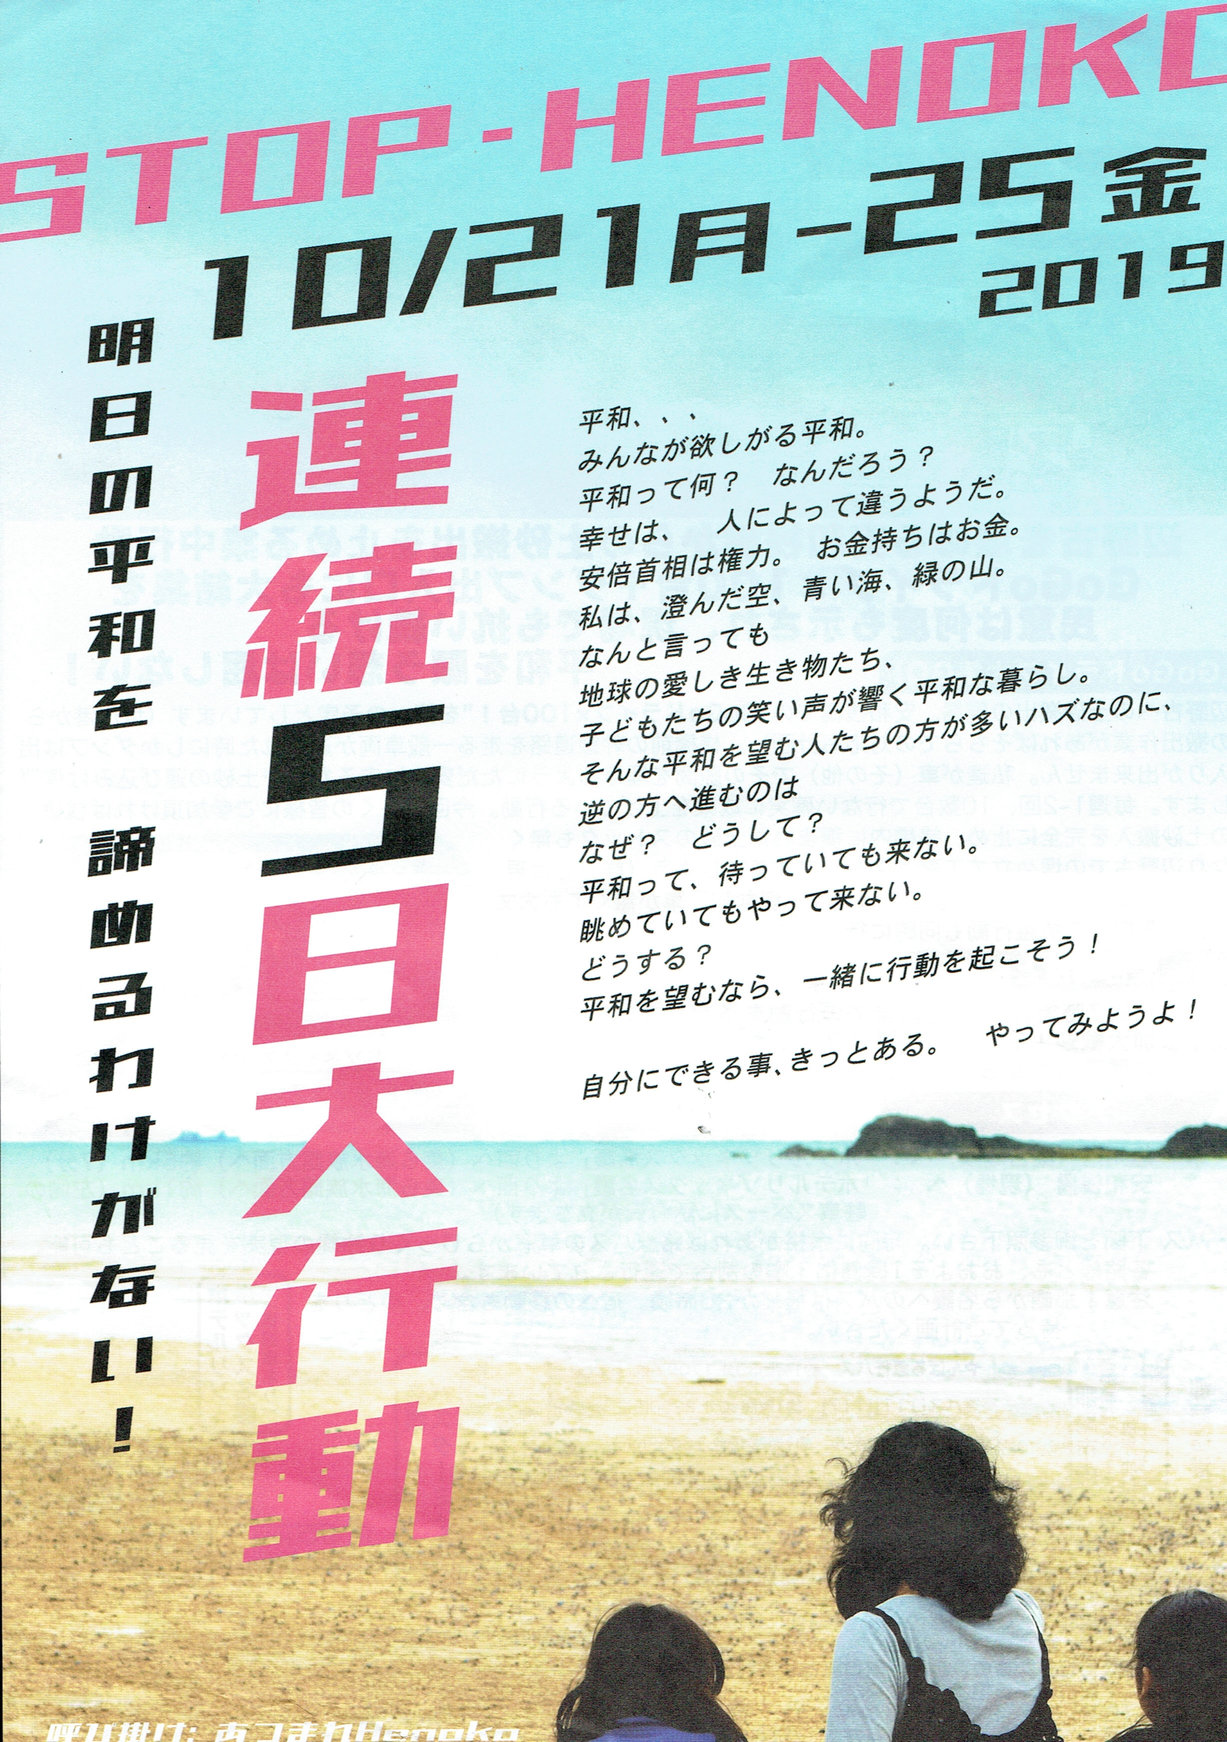 STOP-HENOKO 1021-25 連続5日大行動01